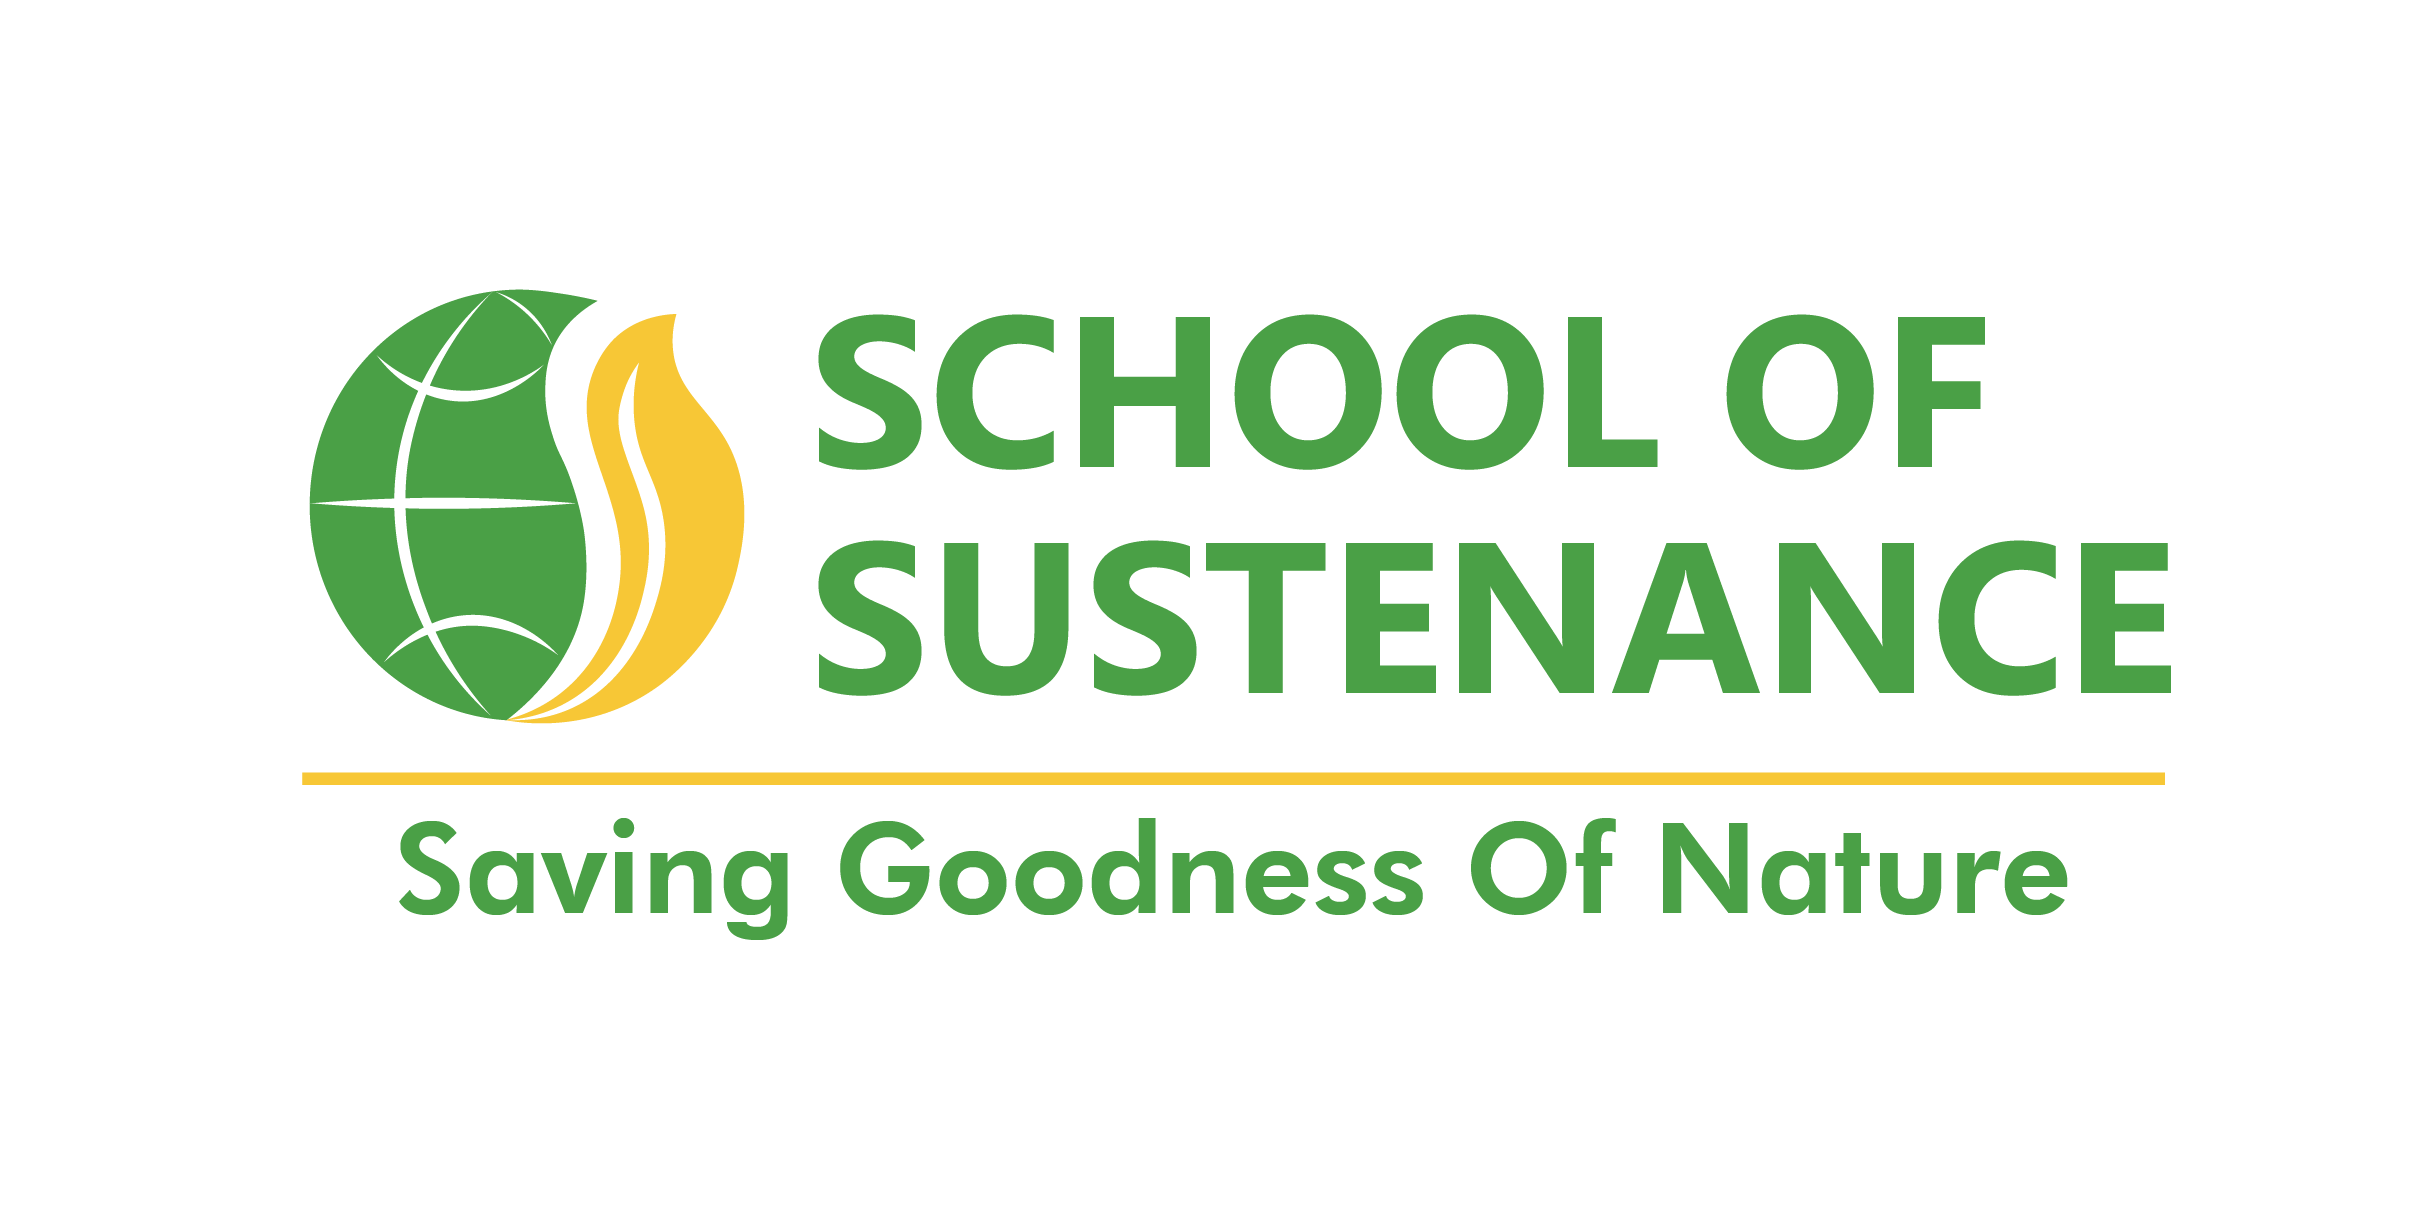 School Of Sustenance